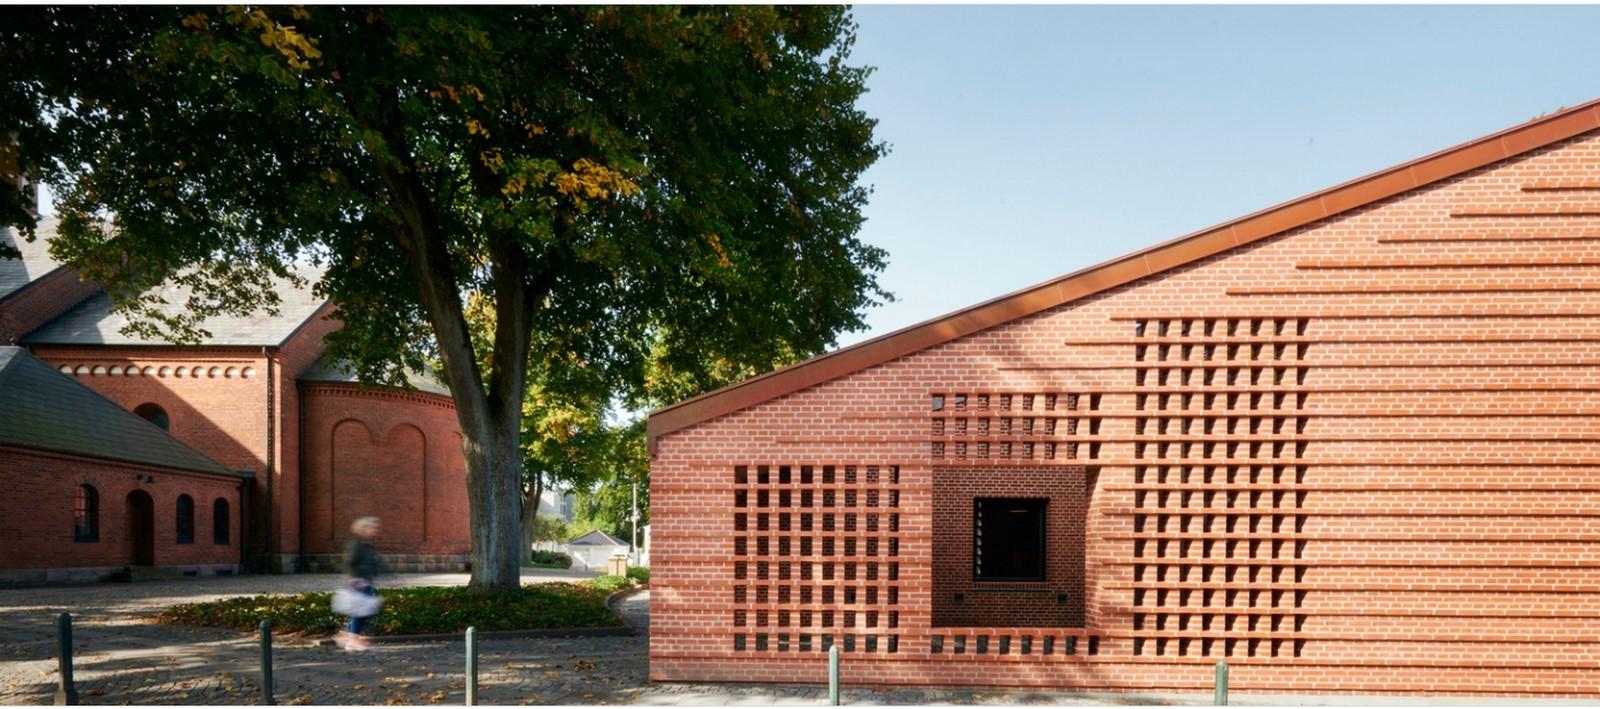 New Church House for Herning Church, Herning - Sheet1